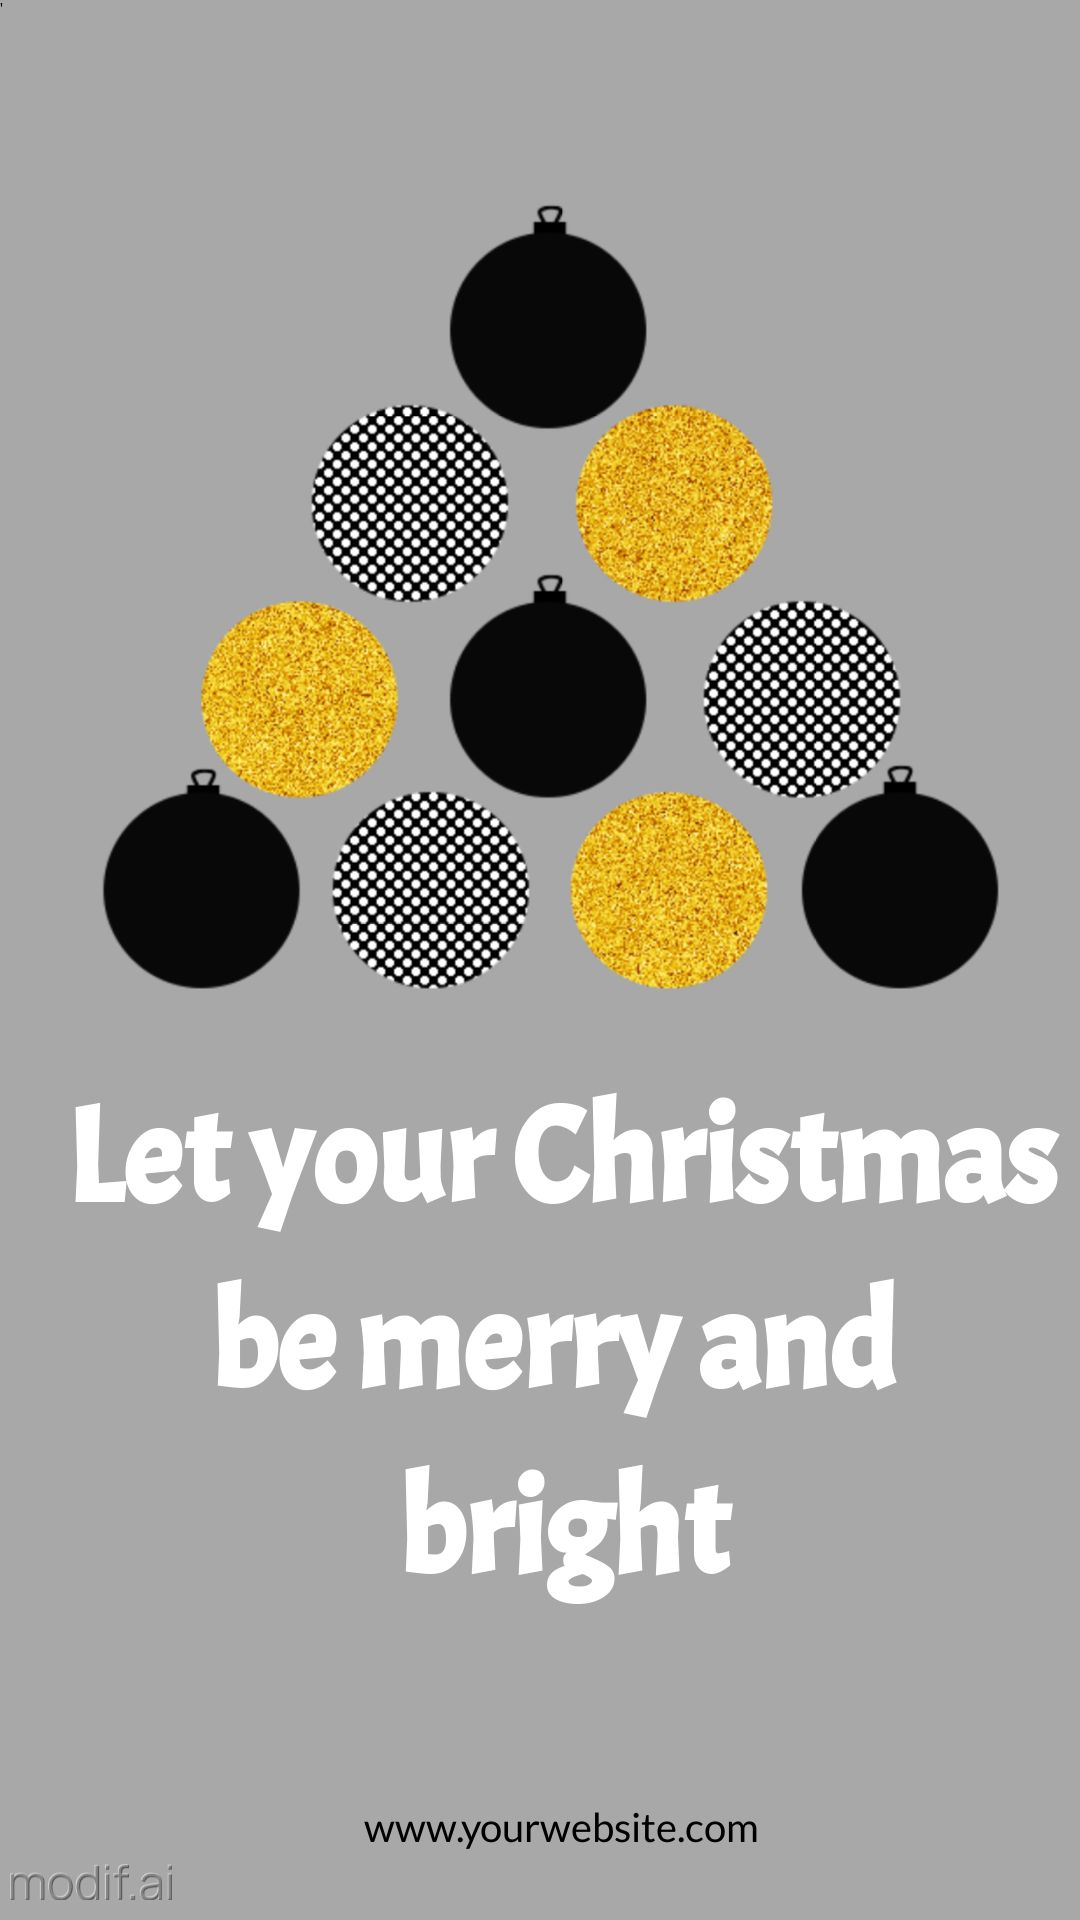 Christmas Tree Wish Card Instagram Story Template